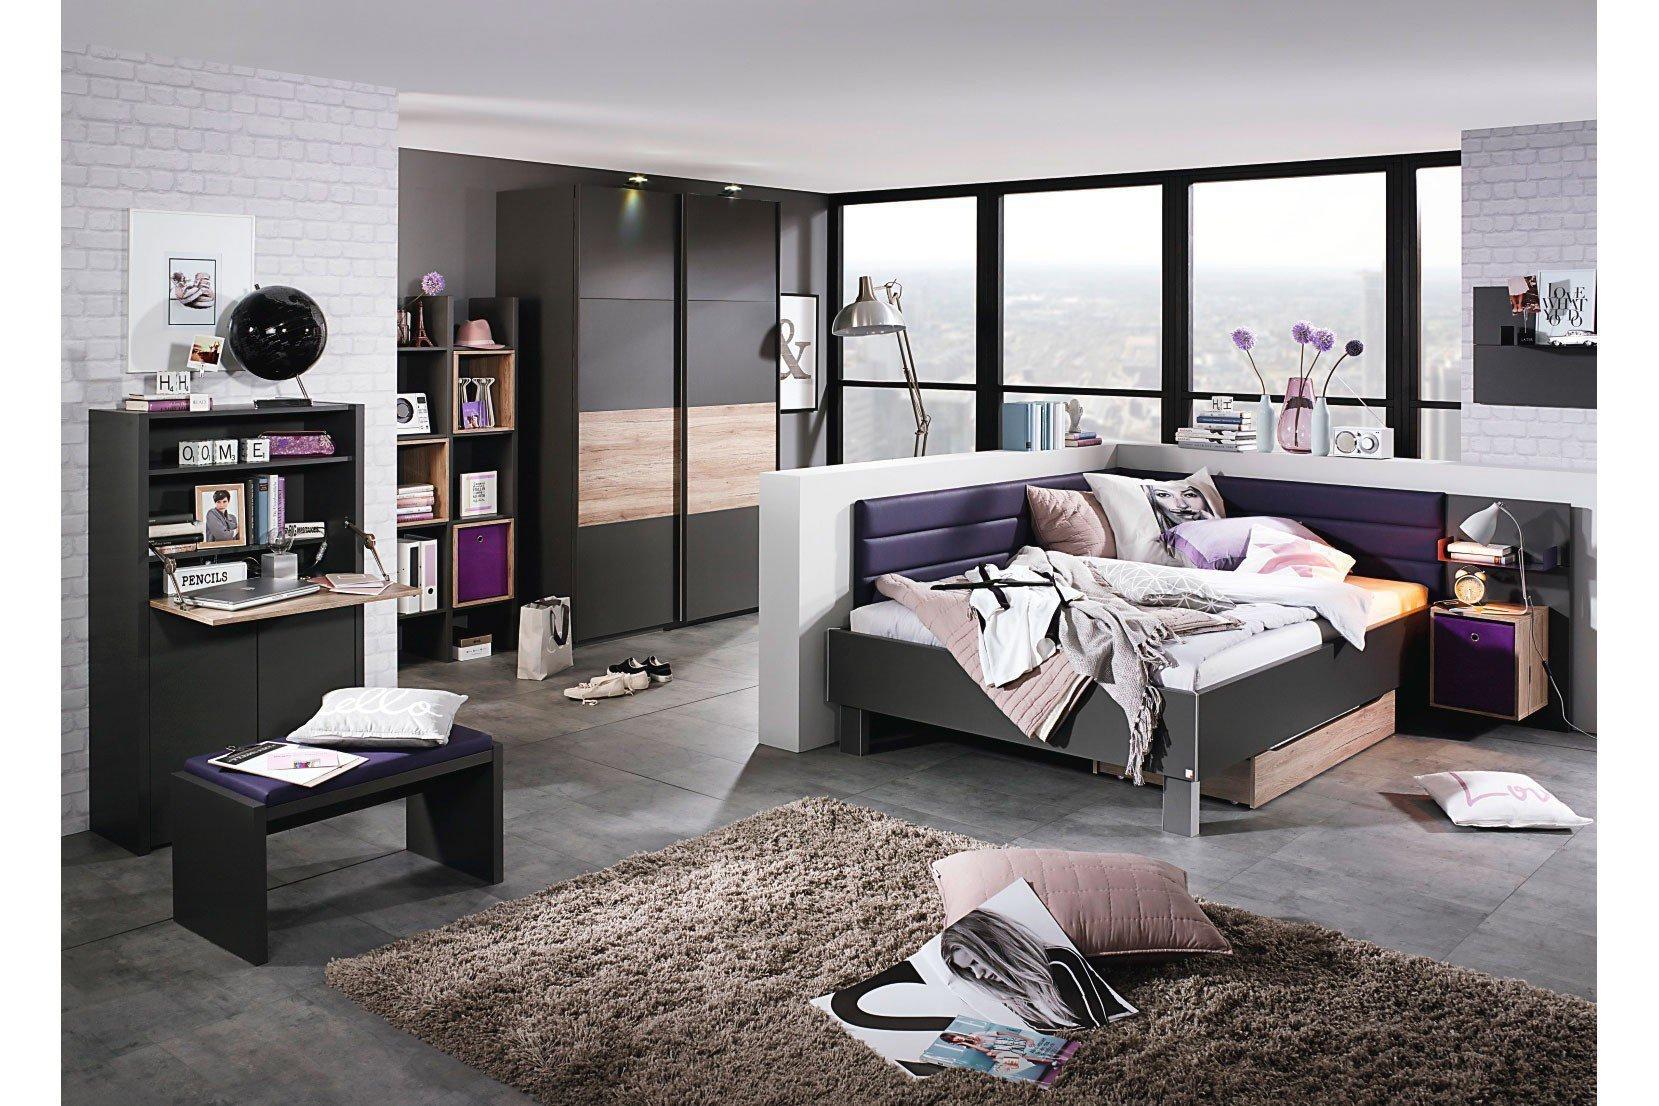 rauch nice4teens apartmentm bel 2 teilig graphit m bel letz ihr online shop. Black Bedroom Furniture Sets. Home Design Ideas